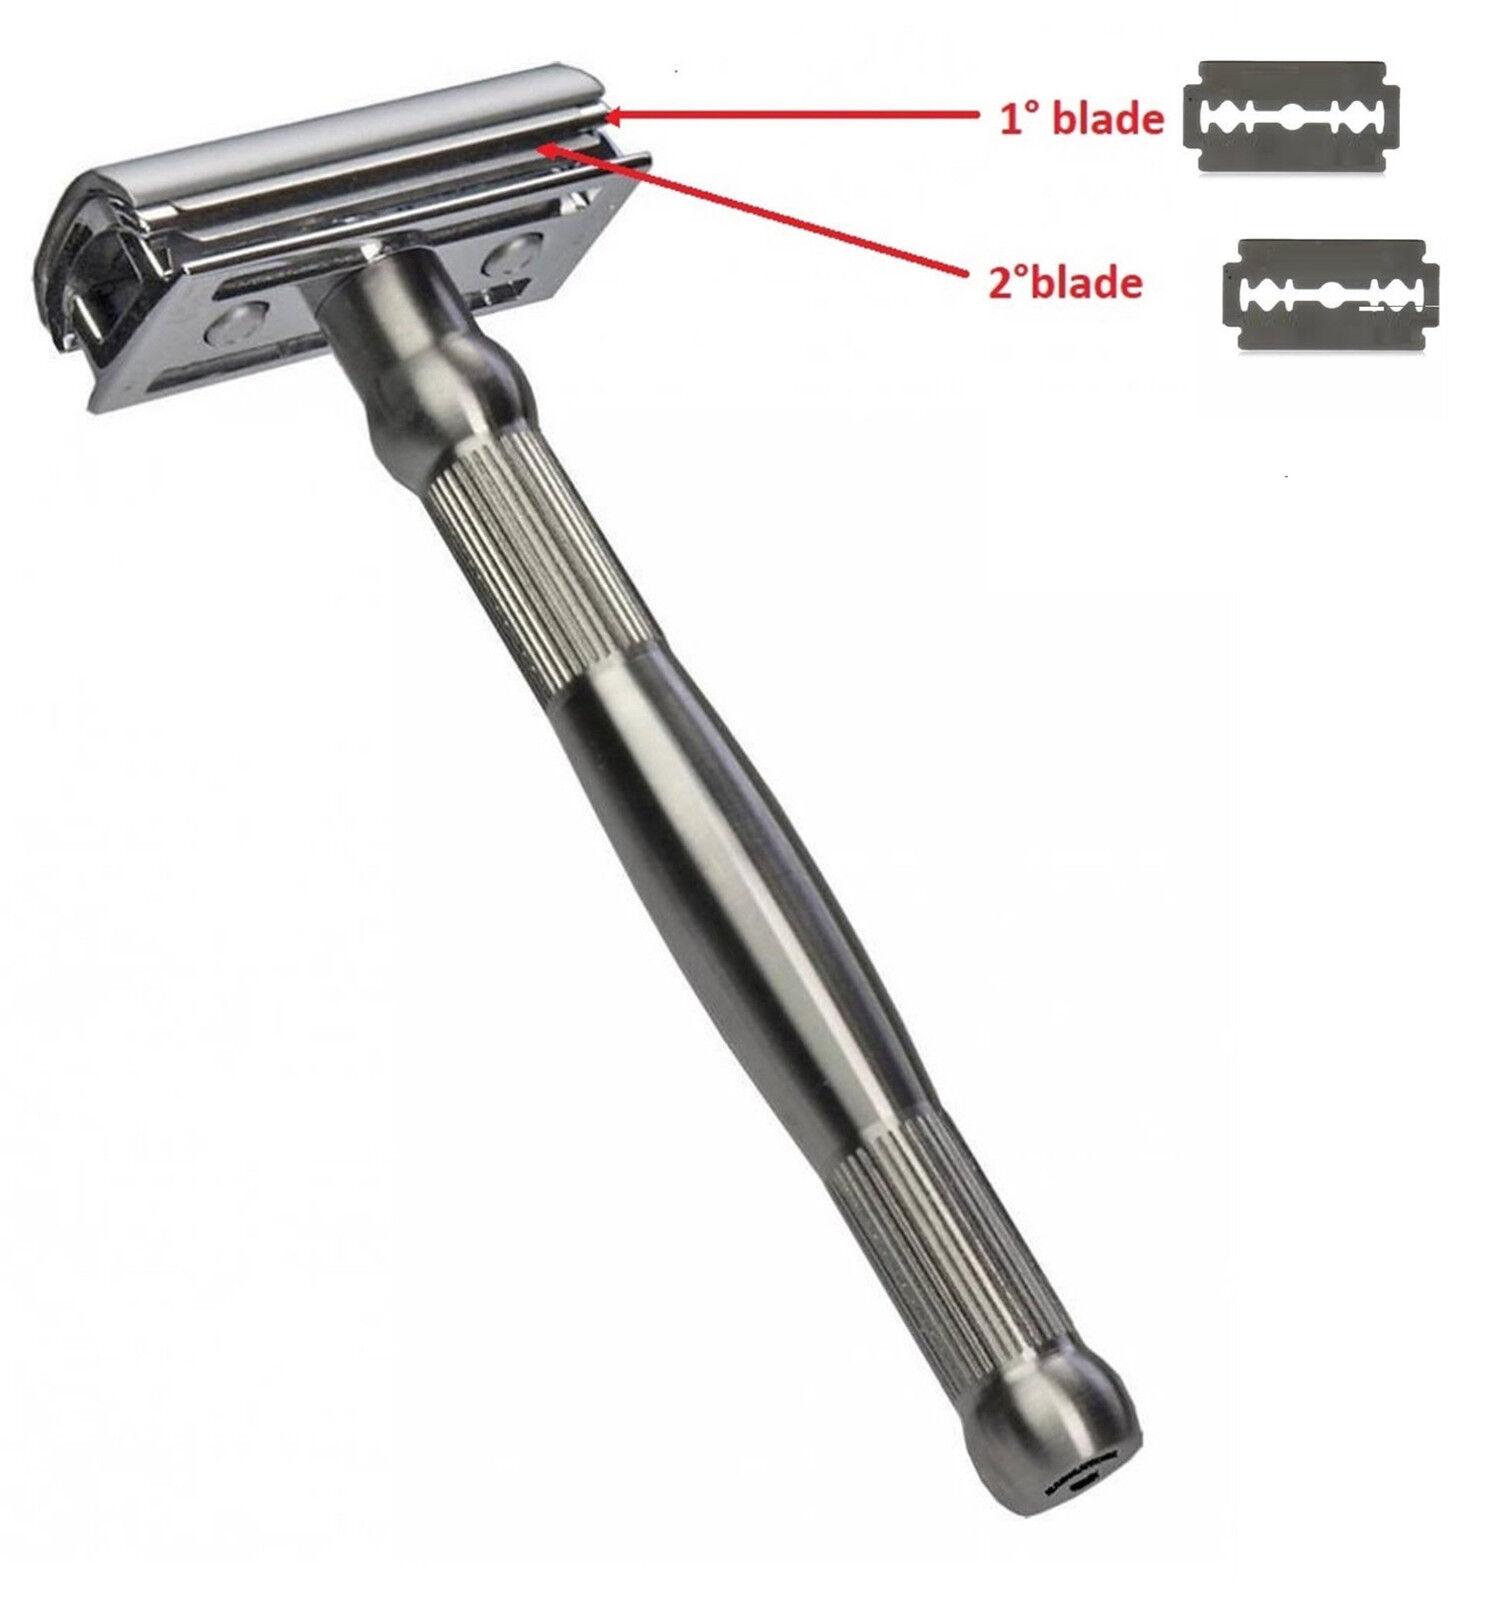 Wilkinson Sword Quad Blade Razor, le nouveau DE/multilame de Wilkinson S-l1600